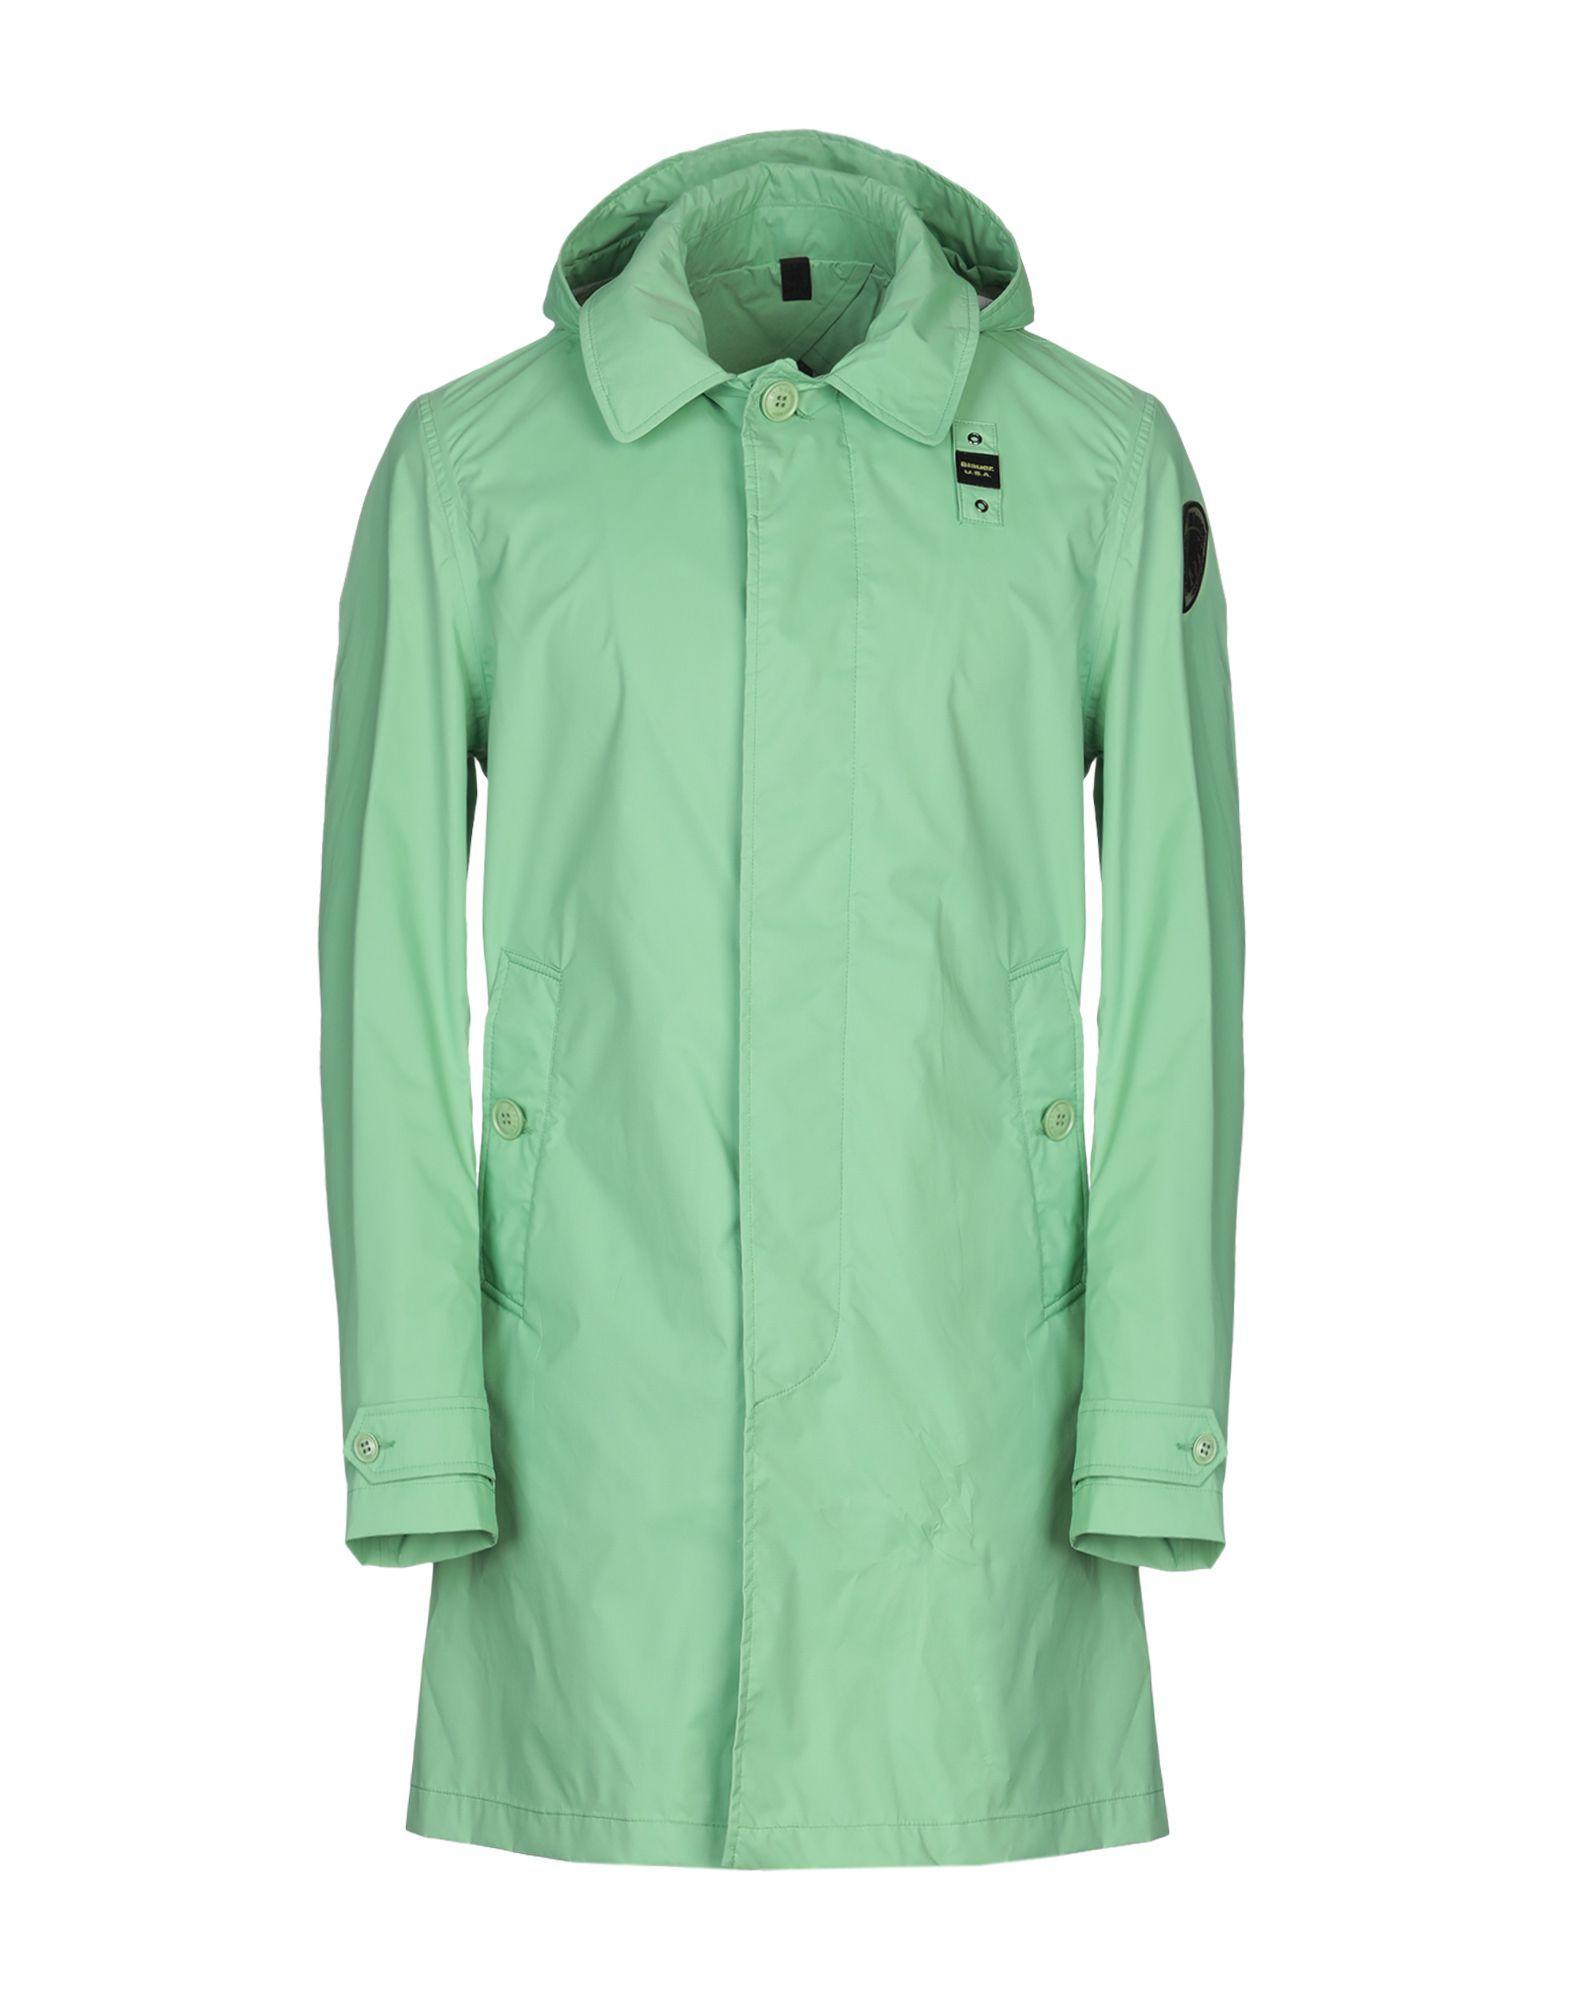 BLAUER OVERCOATS. blauer cloth Jackets, Fashion, Mens